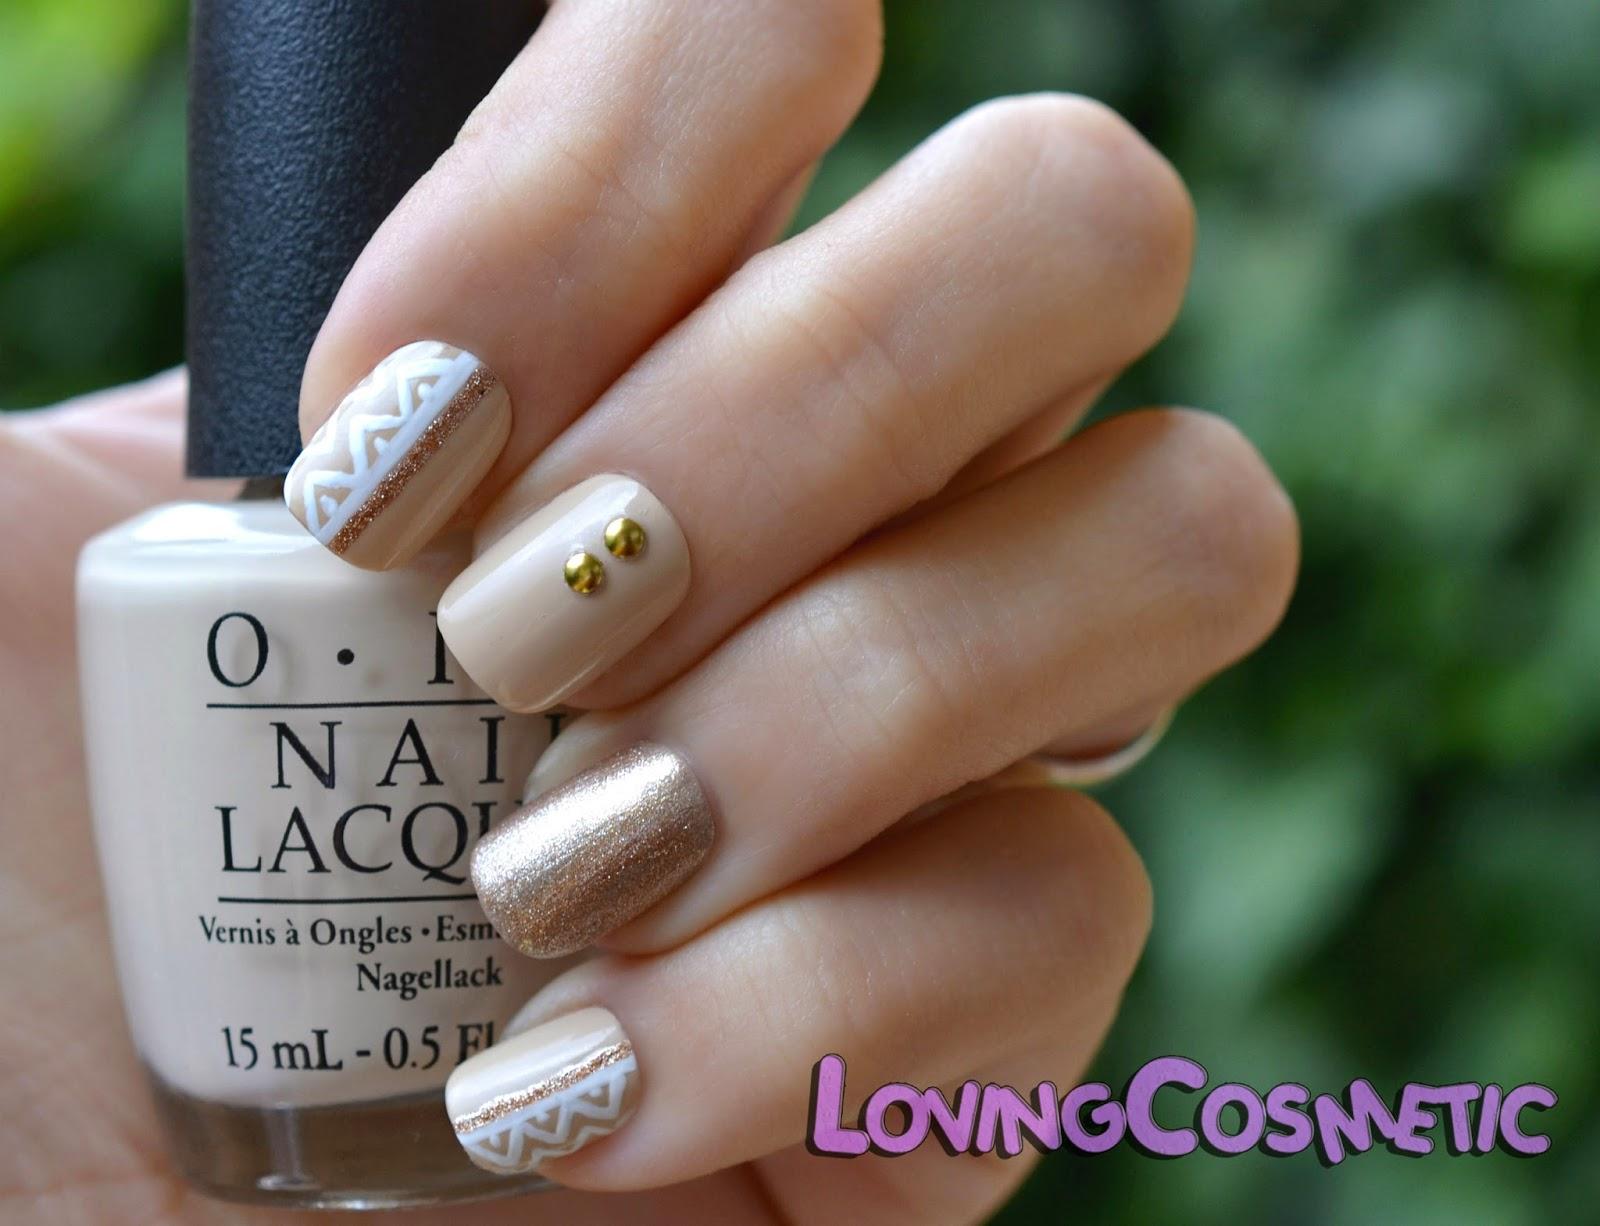 OPI Nail Art Vain-illa Vainilla Uñas diseño de uñas dorado navidad cute fino elegante easy facil nail art